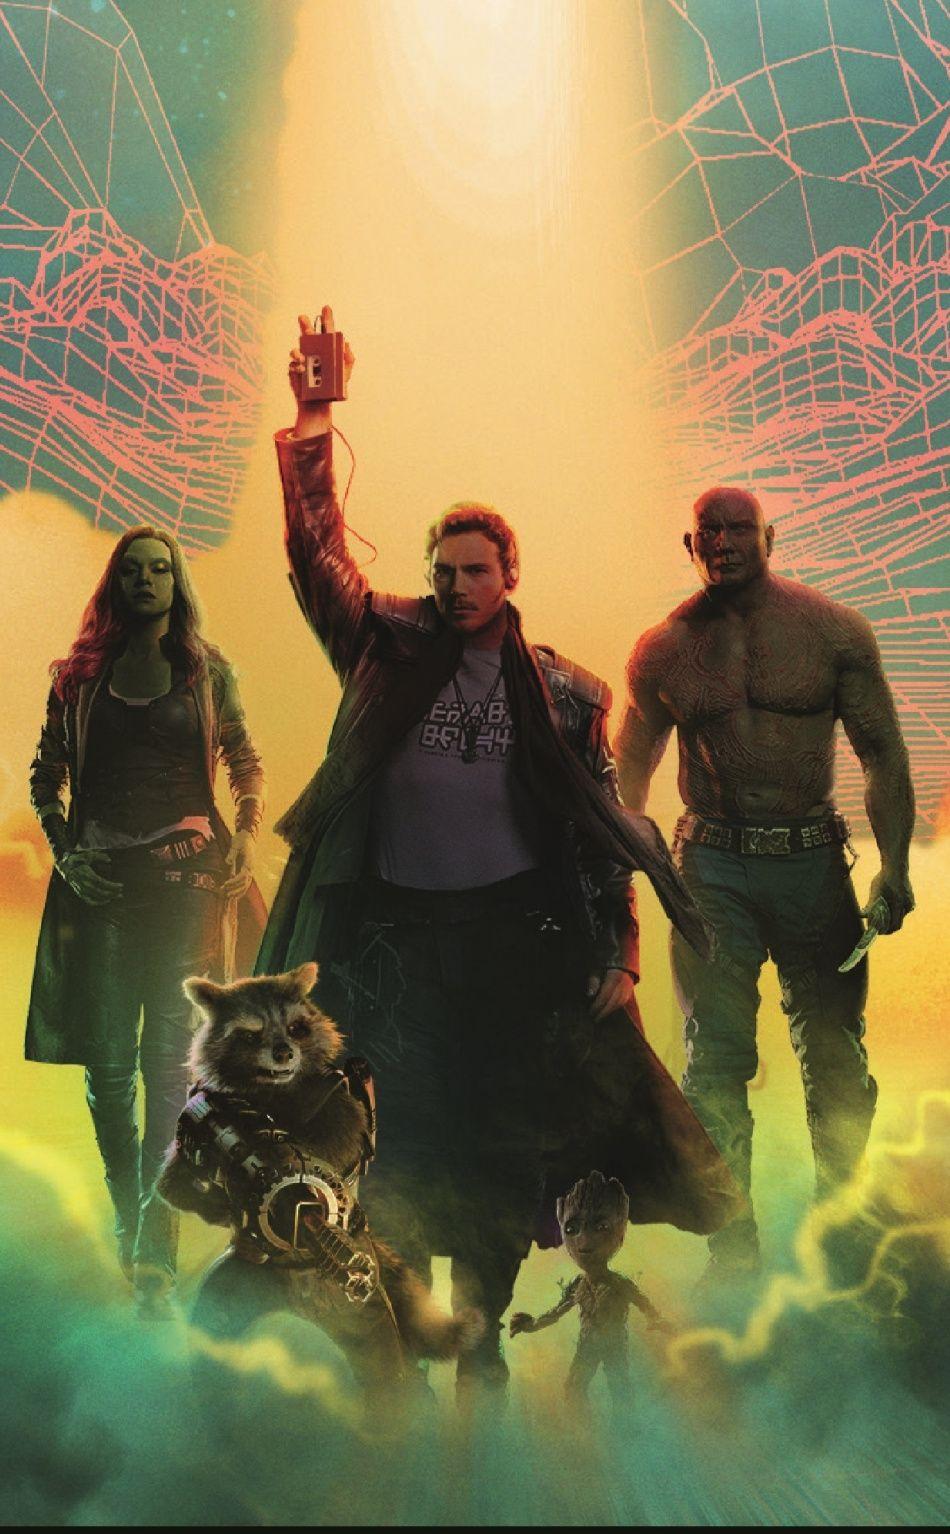 Guardians Of The Galaxy Superhero Team Art 950x1534 Wallpaper Guardians Of The Galaxy Superhero Team Marvel Cinematic Universe